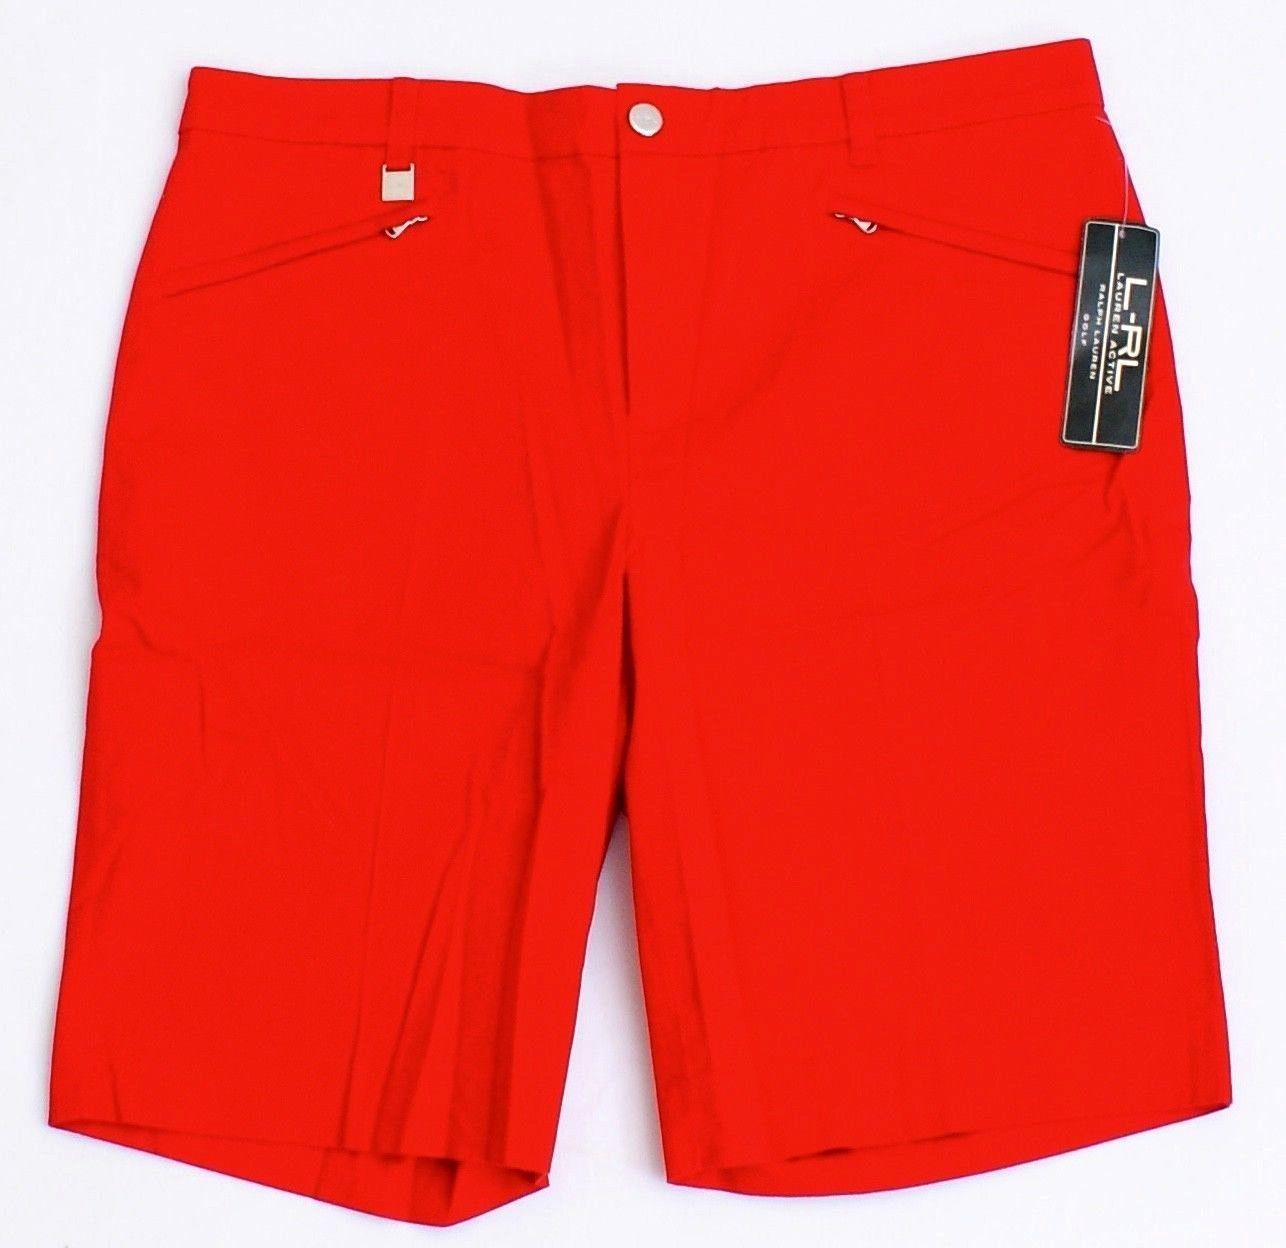 Lauren Active Ralph Lauren Golf Red Cotton Stretch Golf Shorts Women's NWT - $48.74